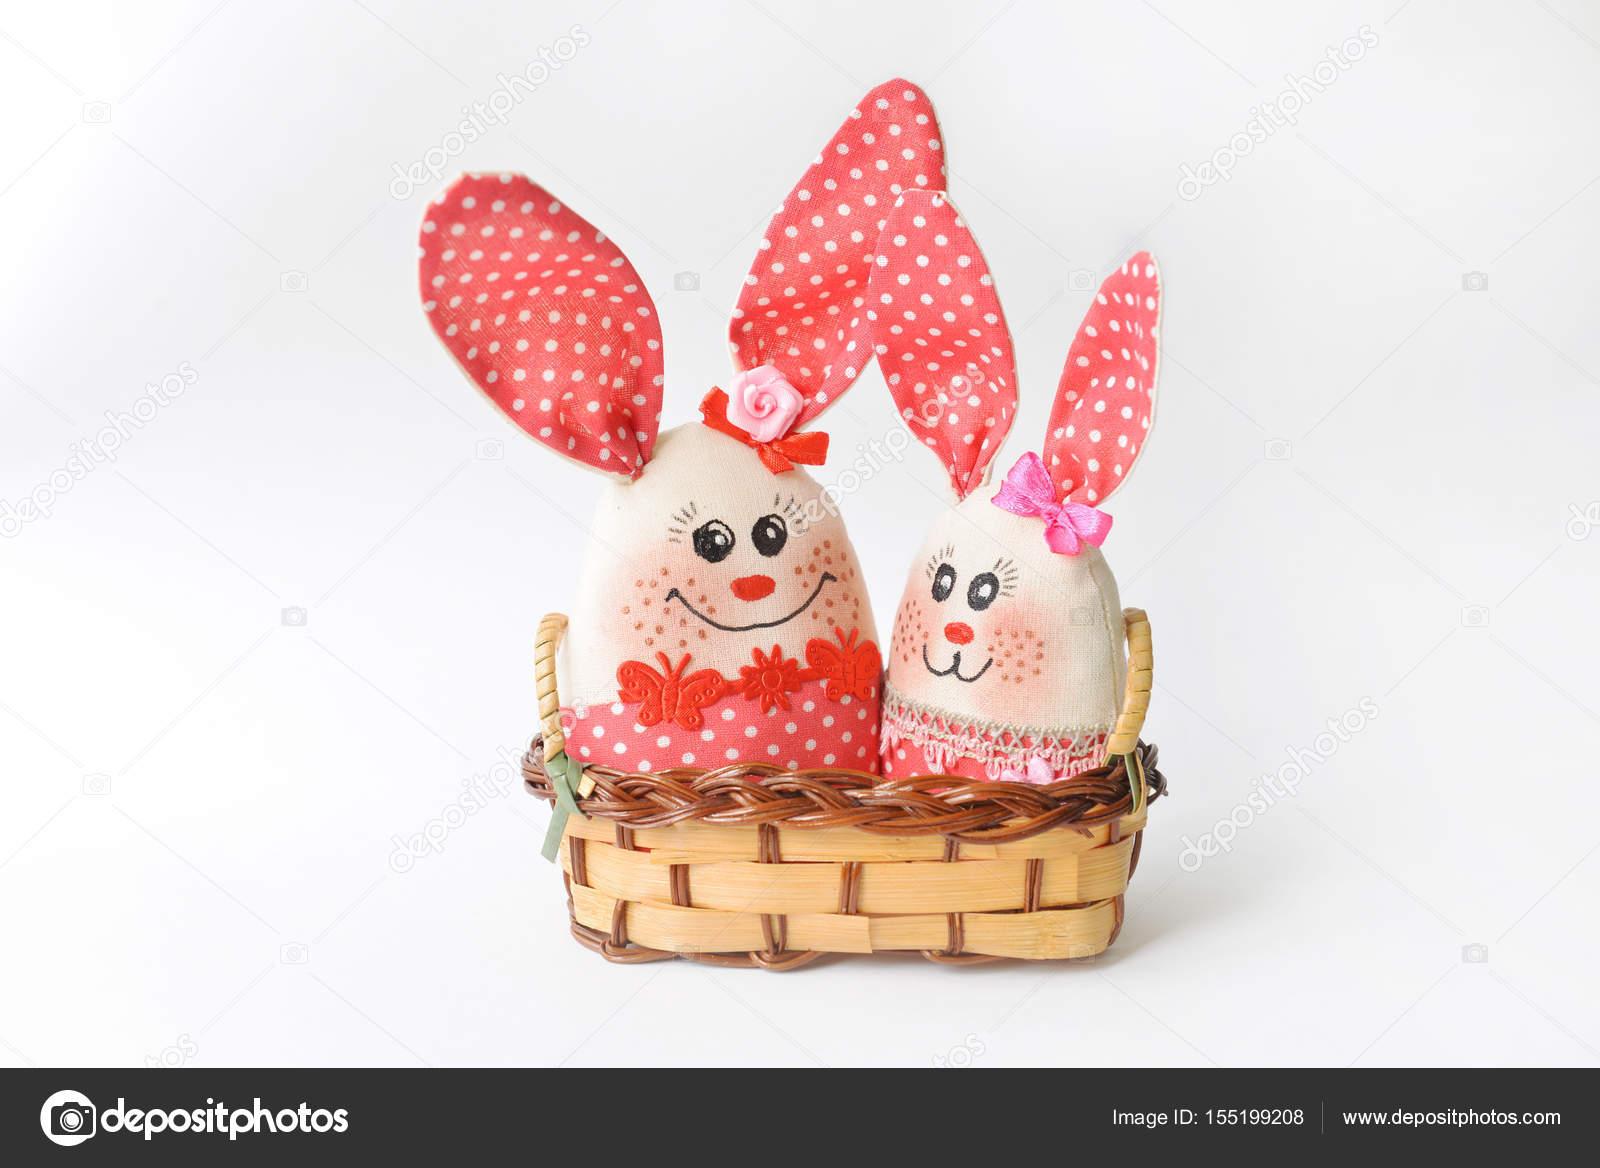 Spielzeug Handarbeit zwei Kaninchen Ostern Nähen — Stockfoto ...